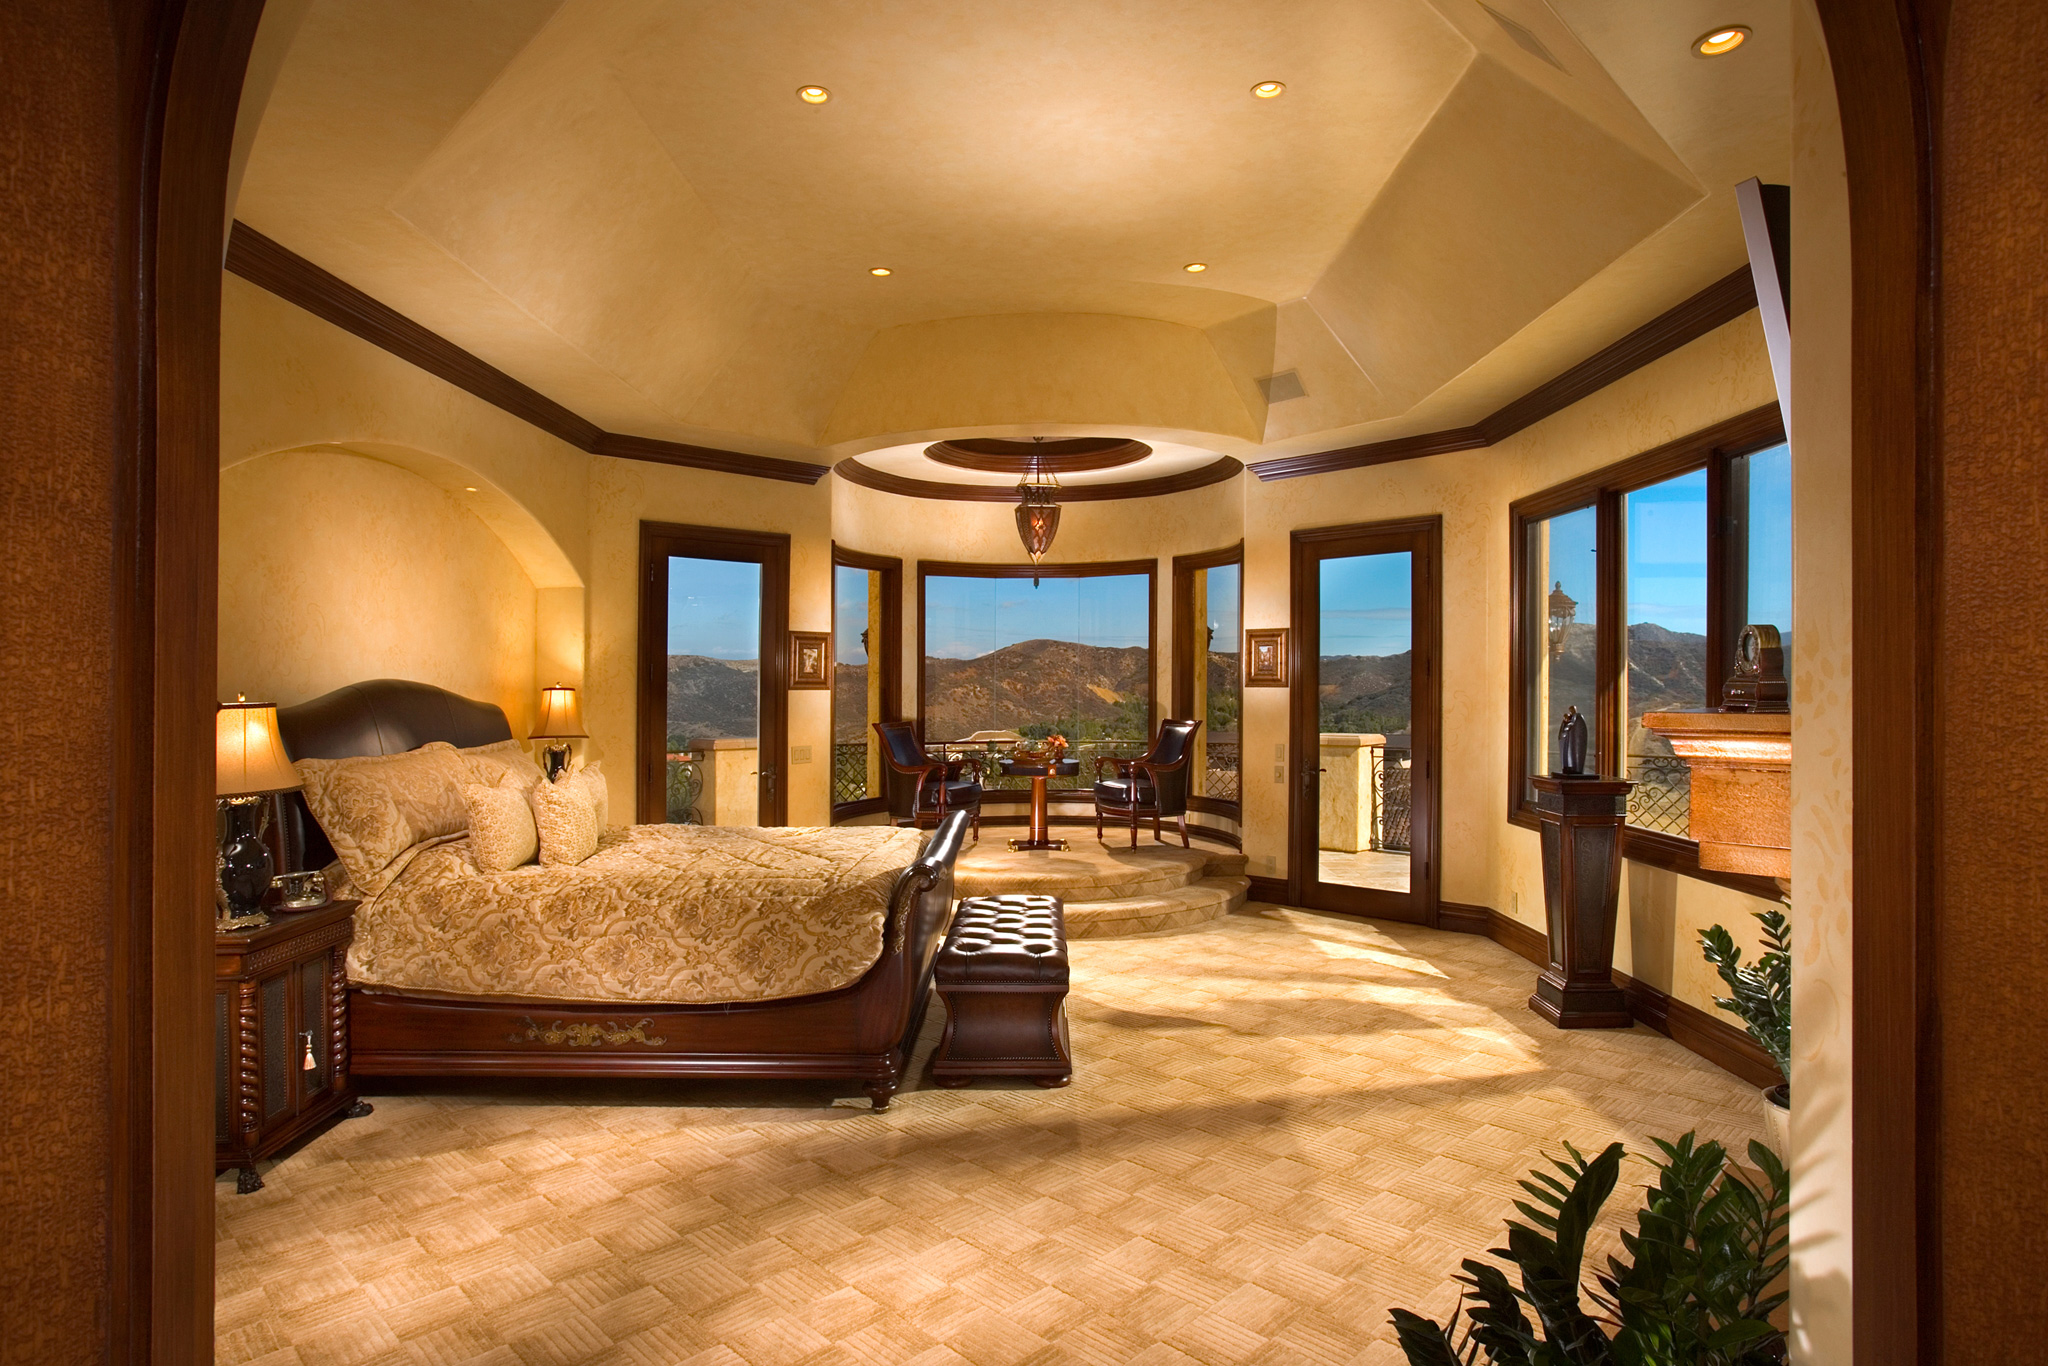 Master Bedroom - The Interior Designs